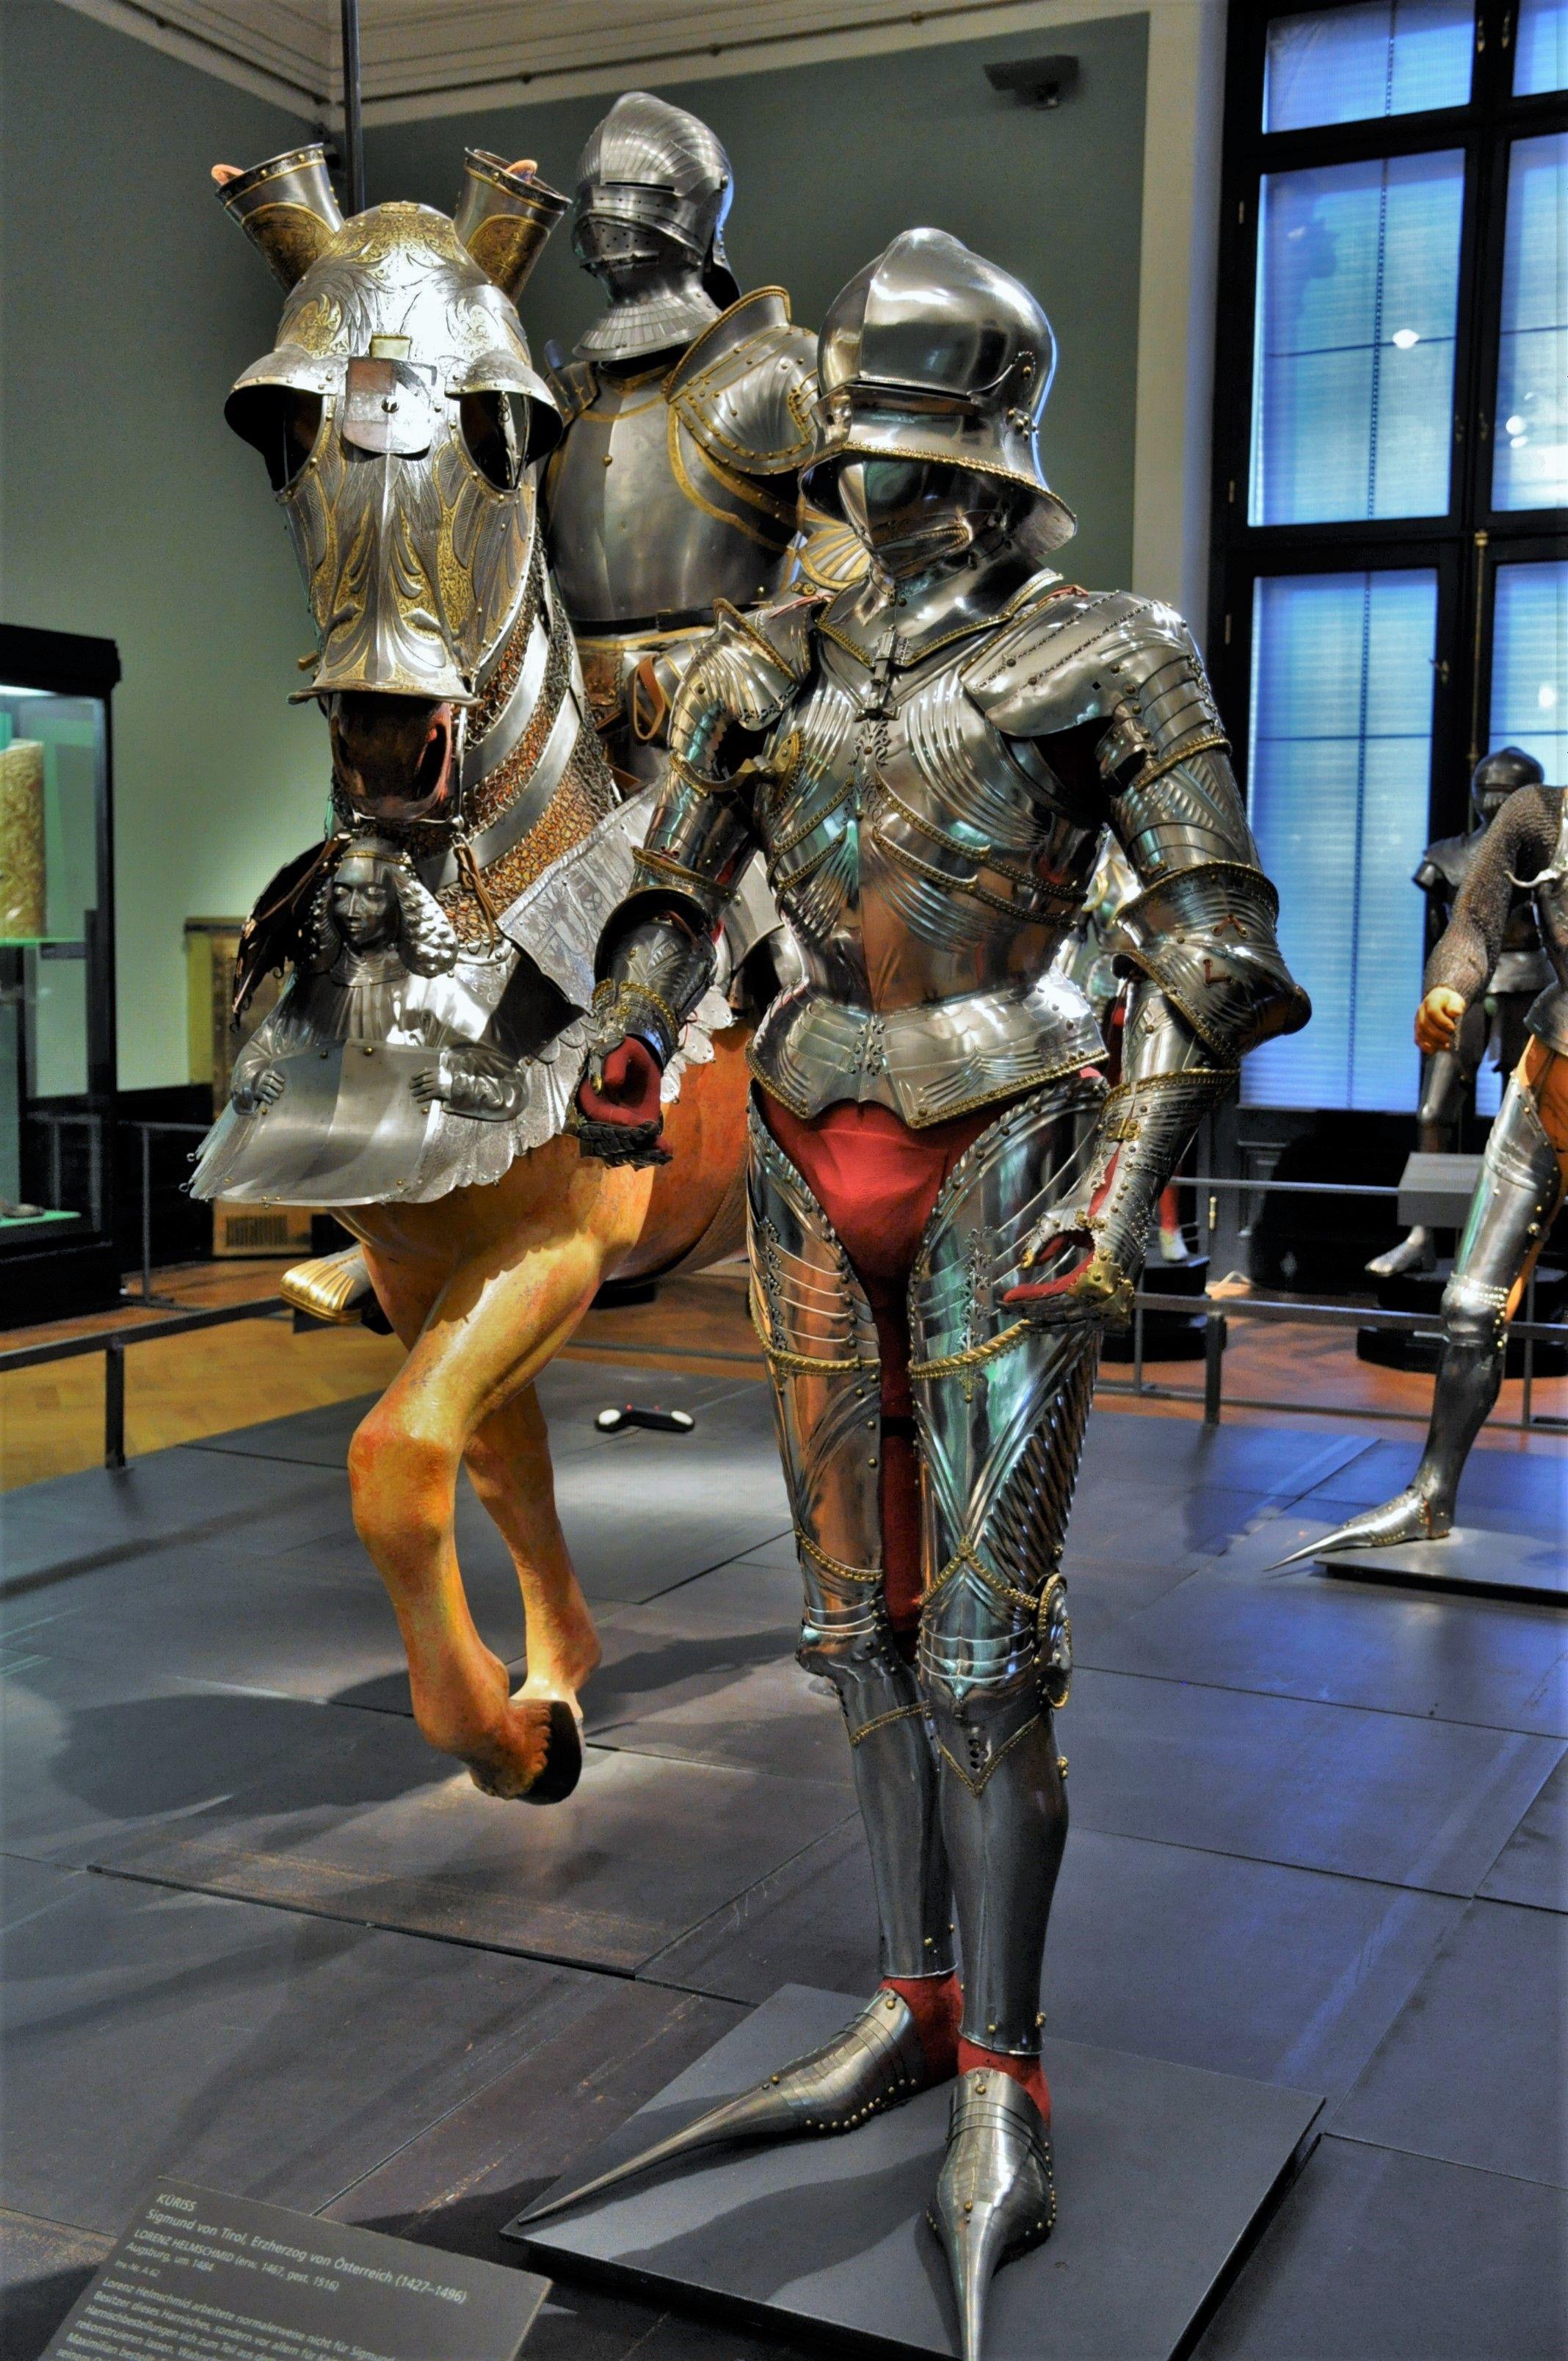 Pin By Alexander Motz On Zbroje In 2020 Medieval Armor Century Armor Knight Armor